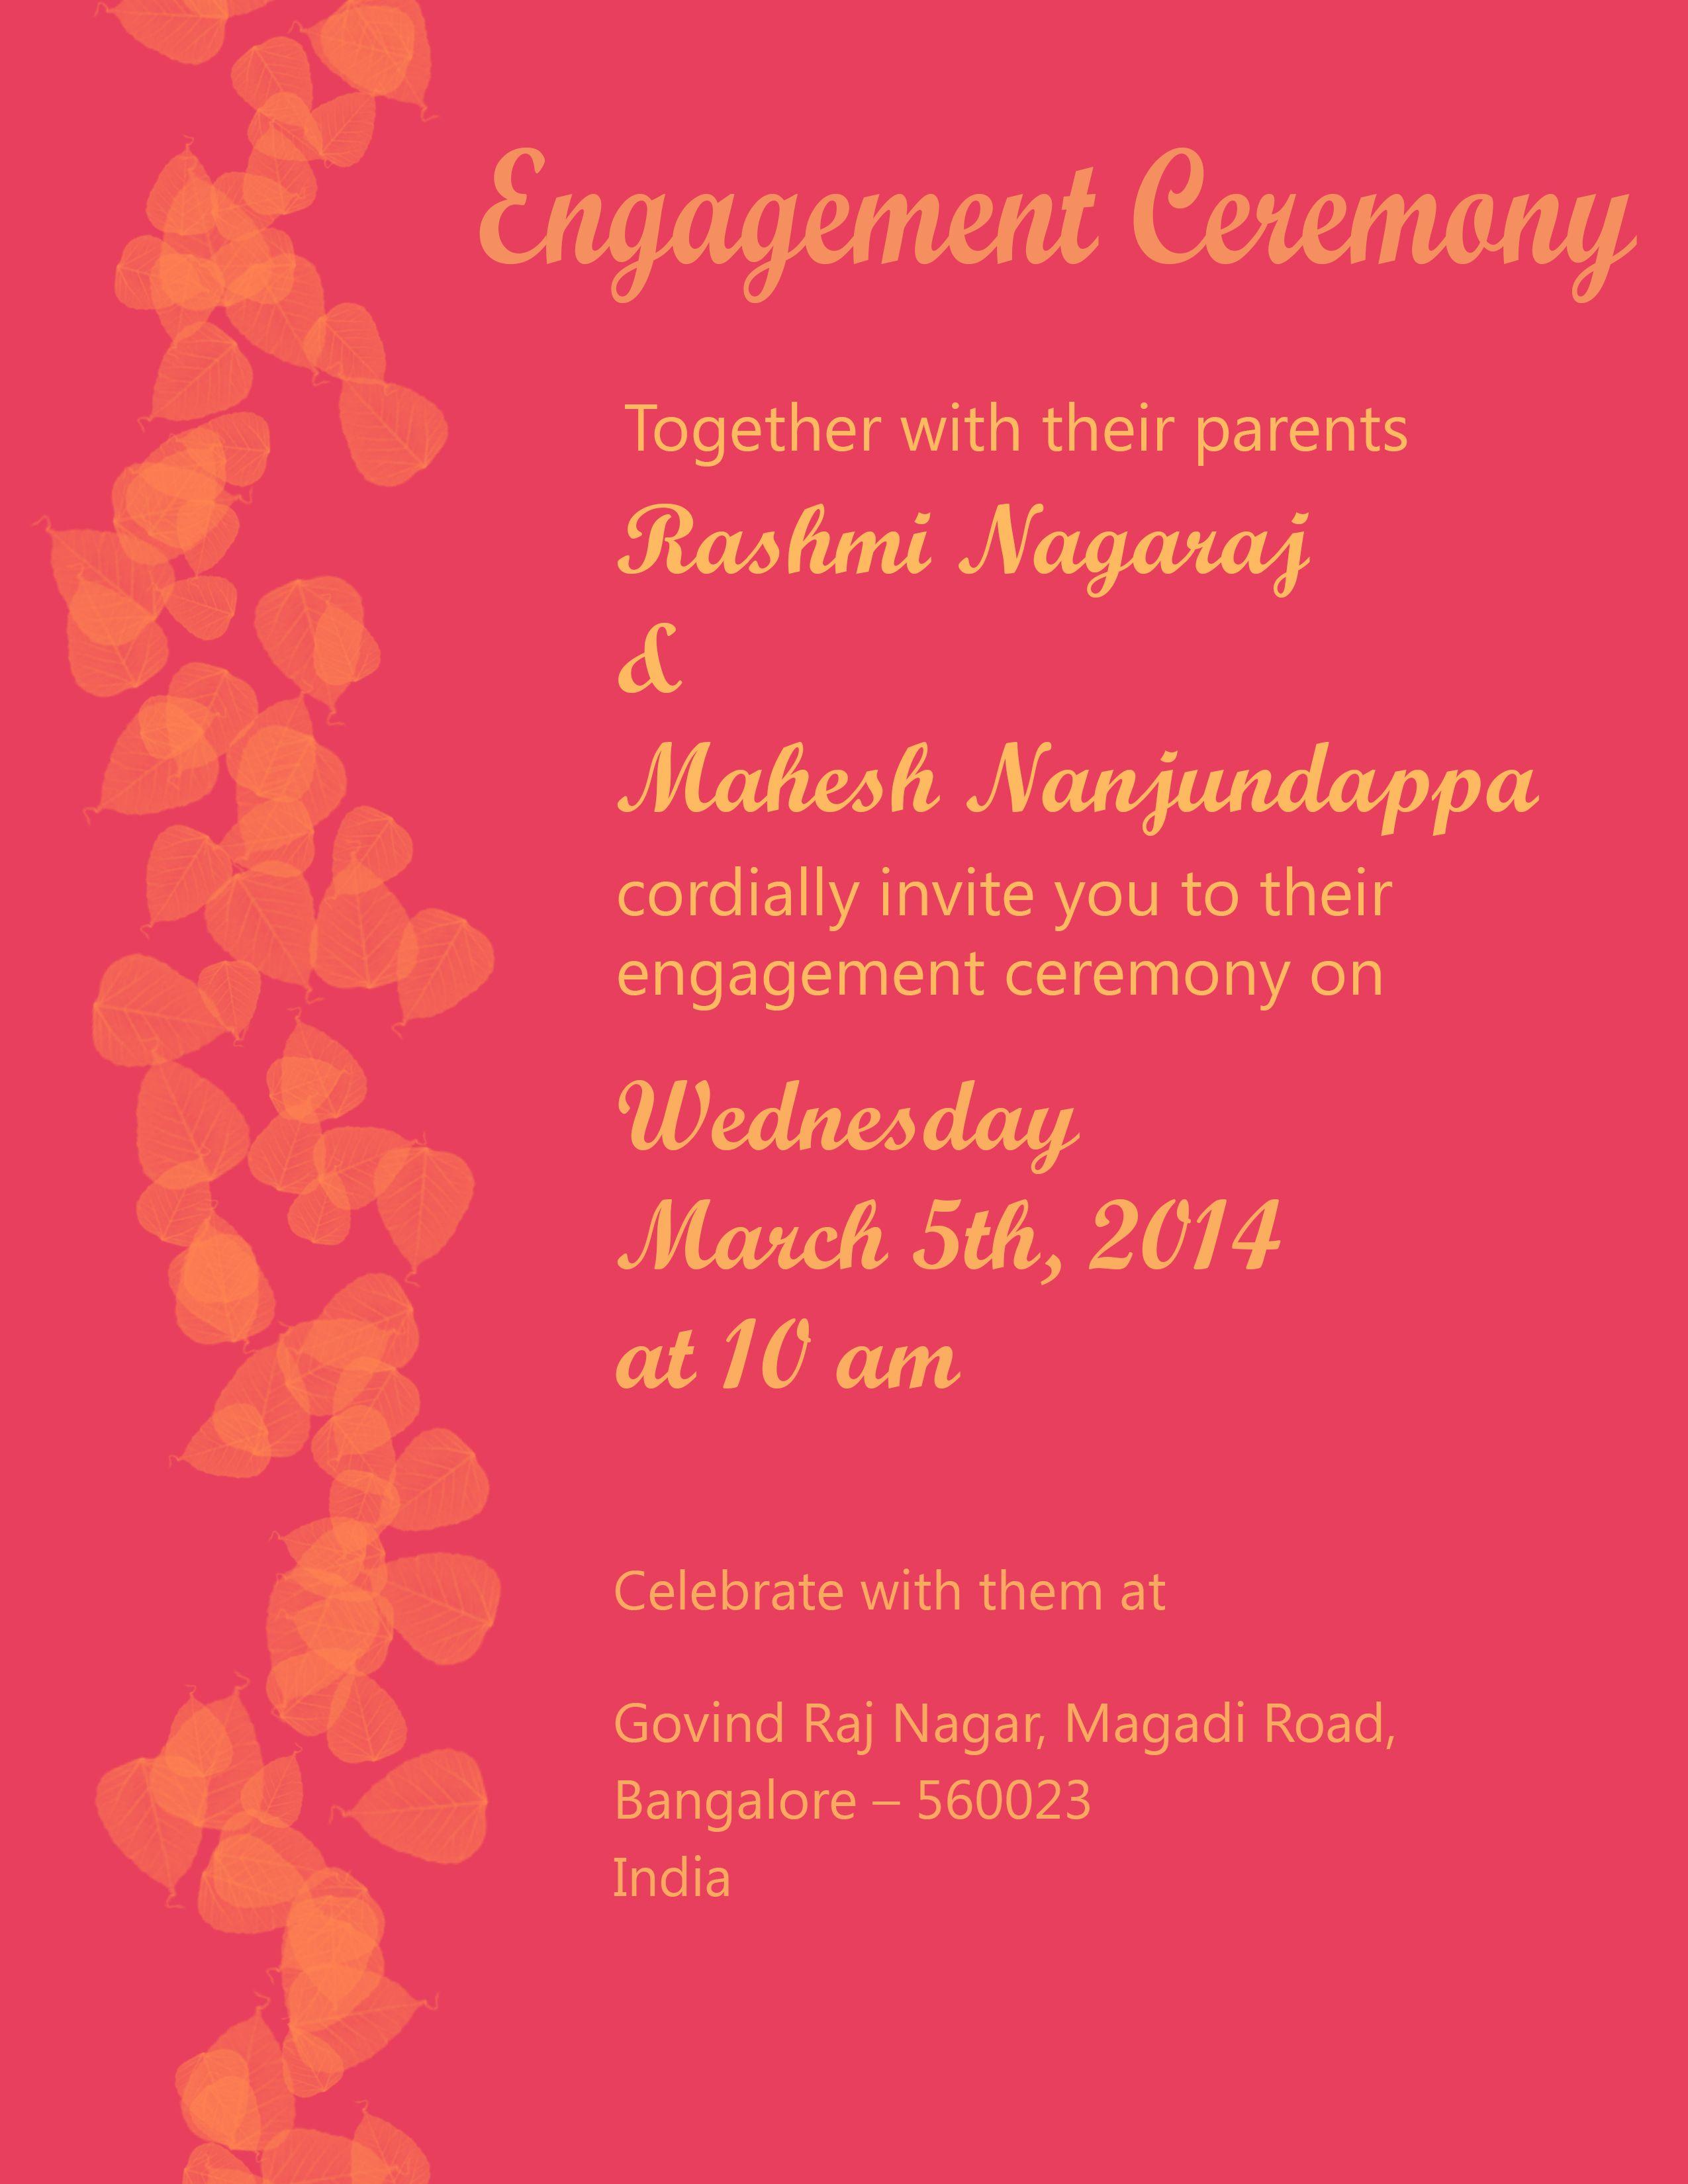 Engagement Invitation Card Design Indian Wedding Engagement Invitation Cards Engagement Invitations Engagement Cards